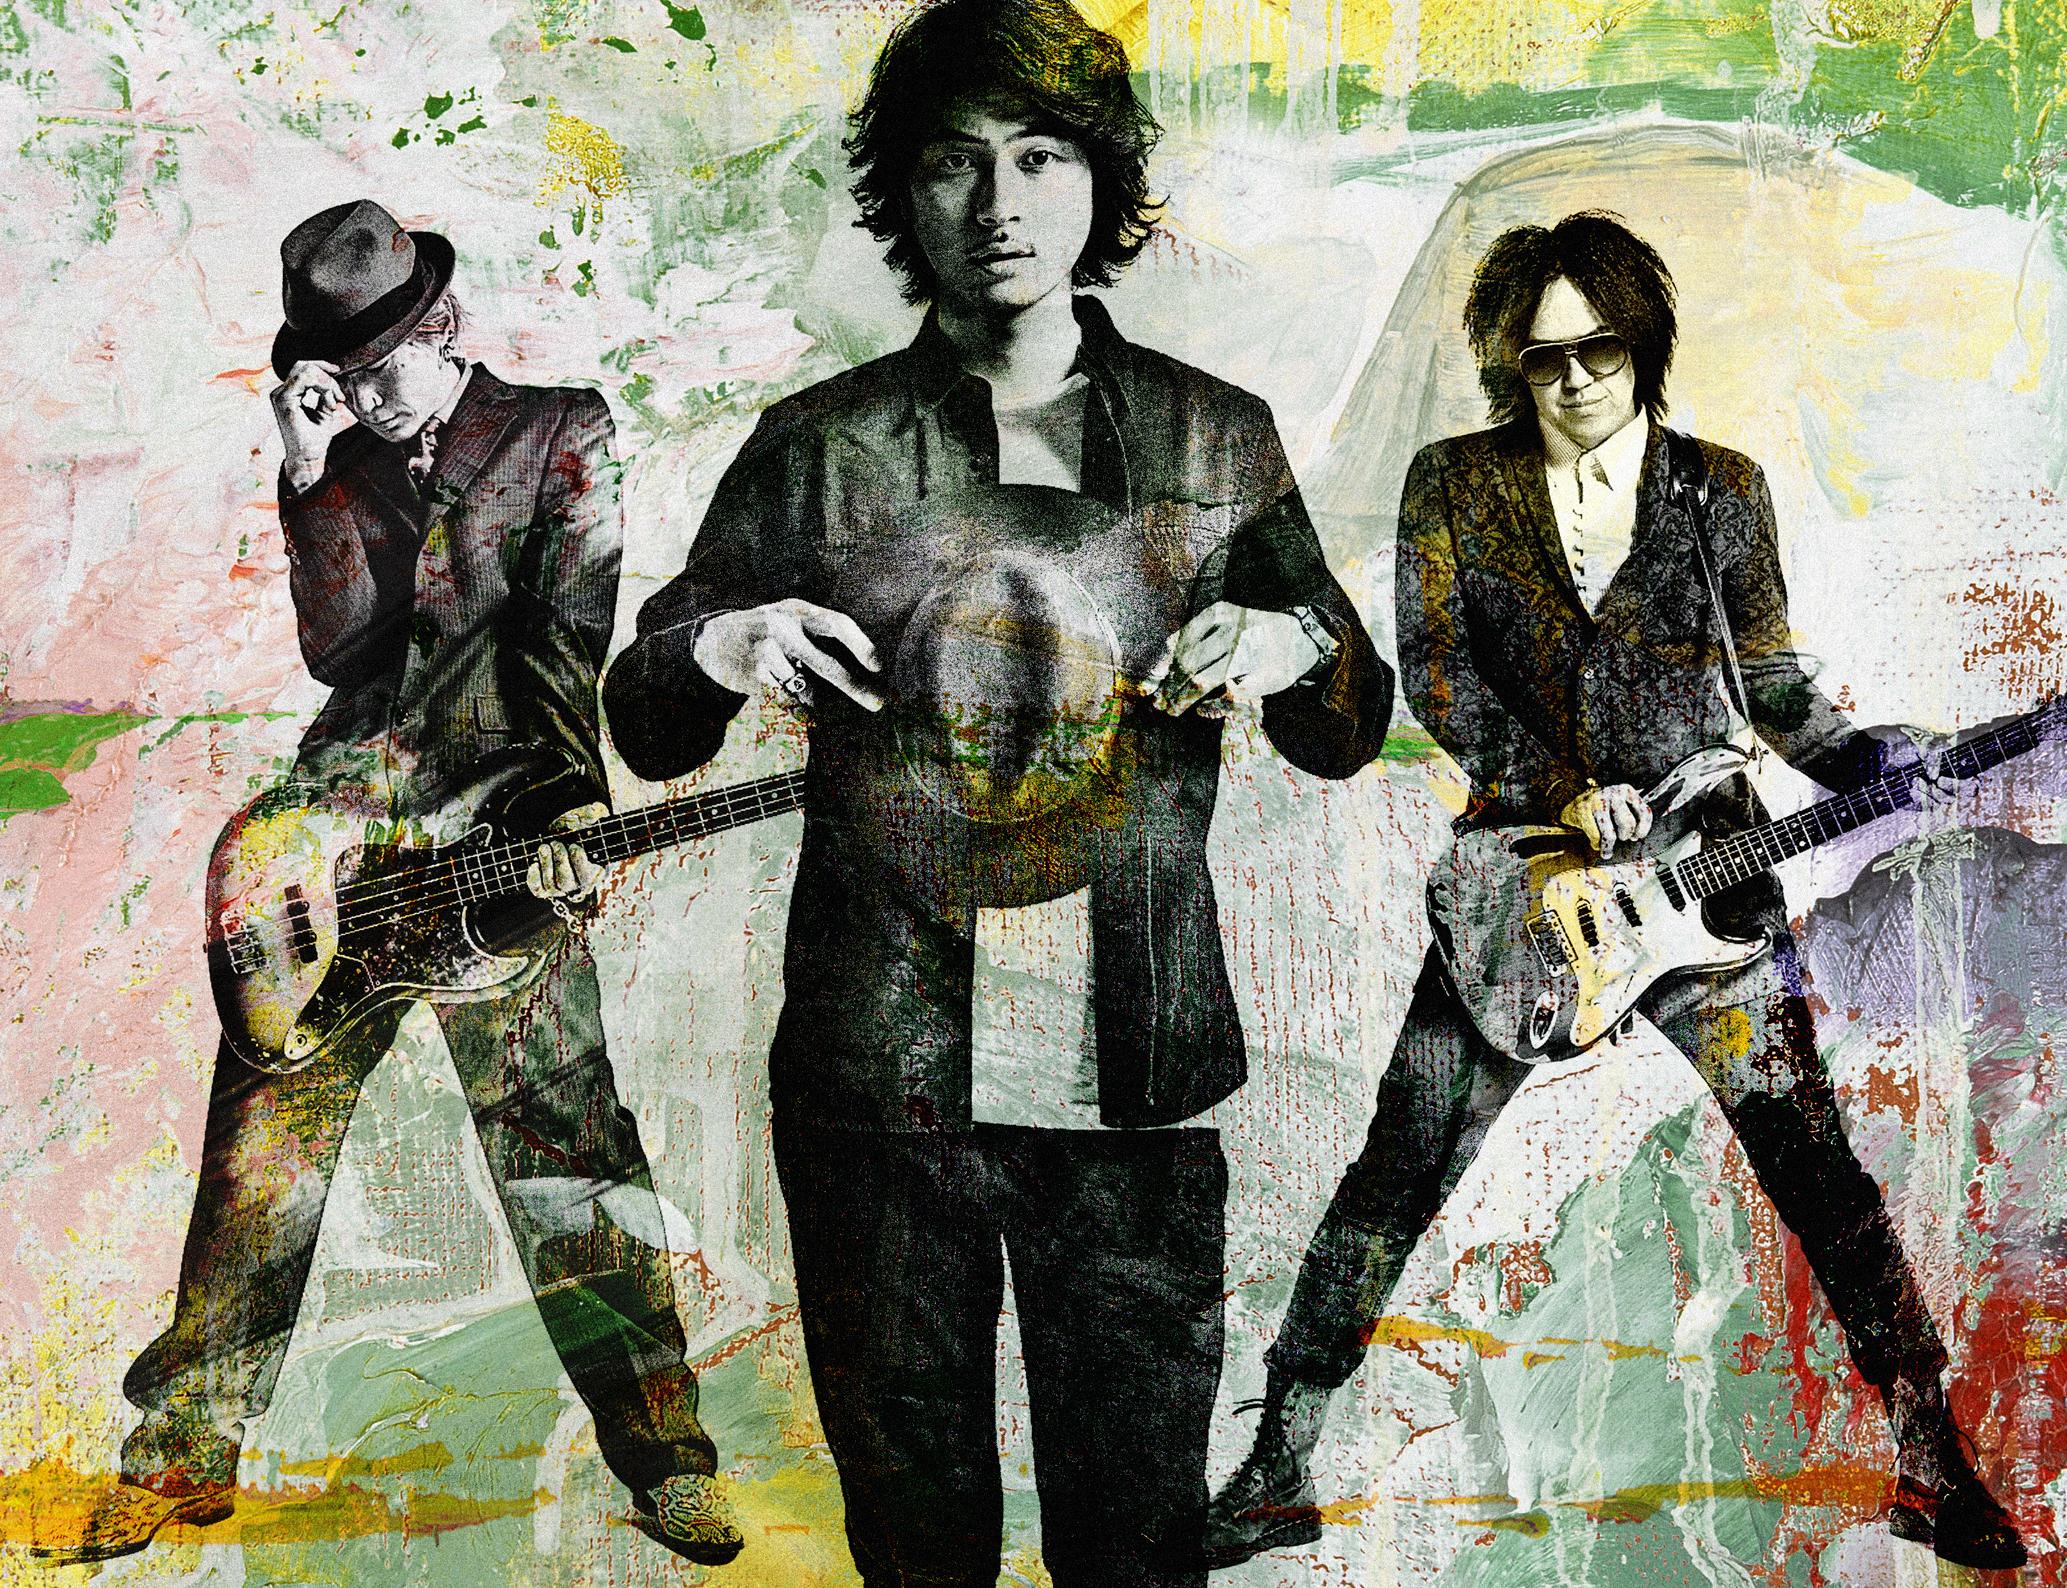 L→R Ju-ken(Ba)、Rueed(Vo)、Ai Ishigaki(Gu)